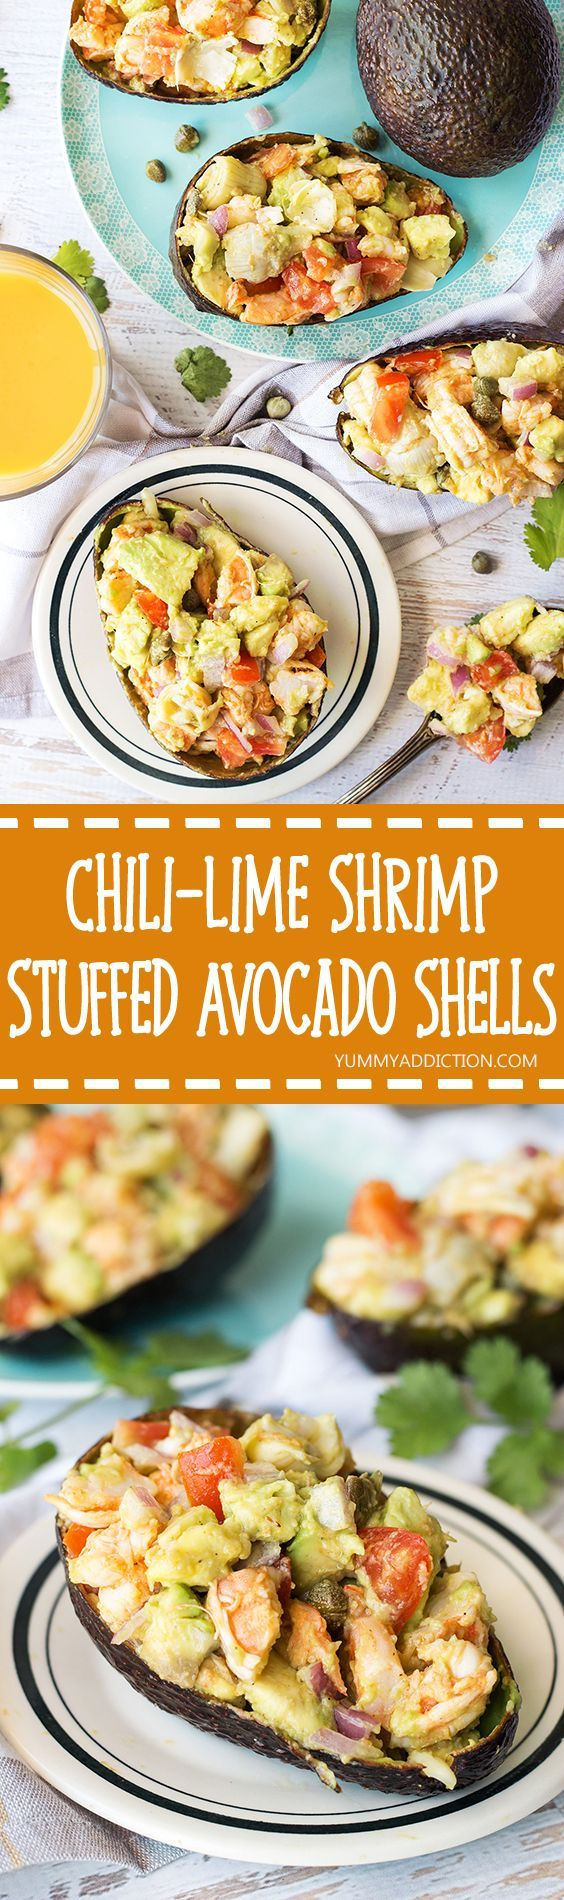 ChiliLime Shrimp Stuffed Avocado Shells Recipe Best